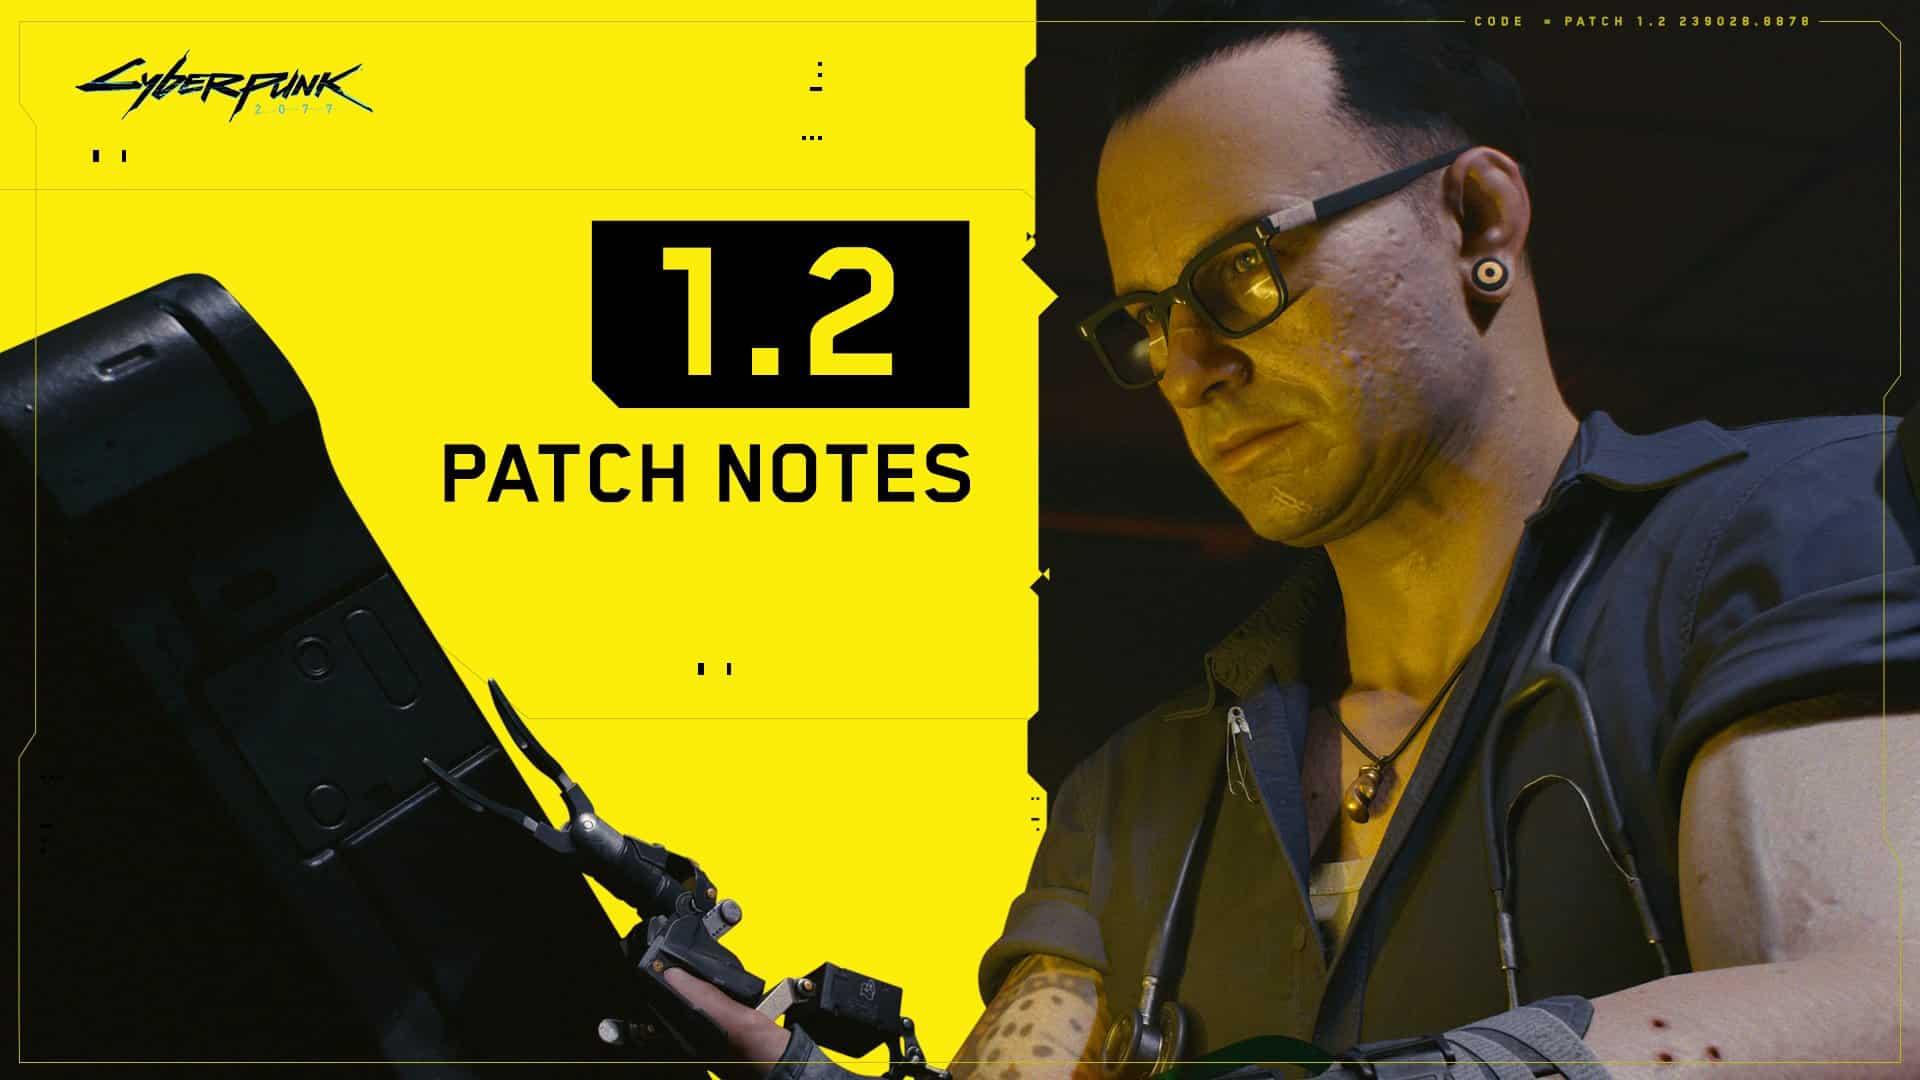 Cyberpunk 2077 Patch 1.2 Notes